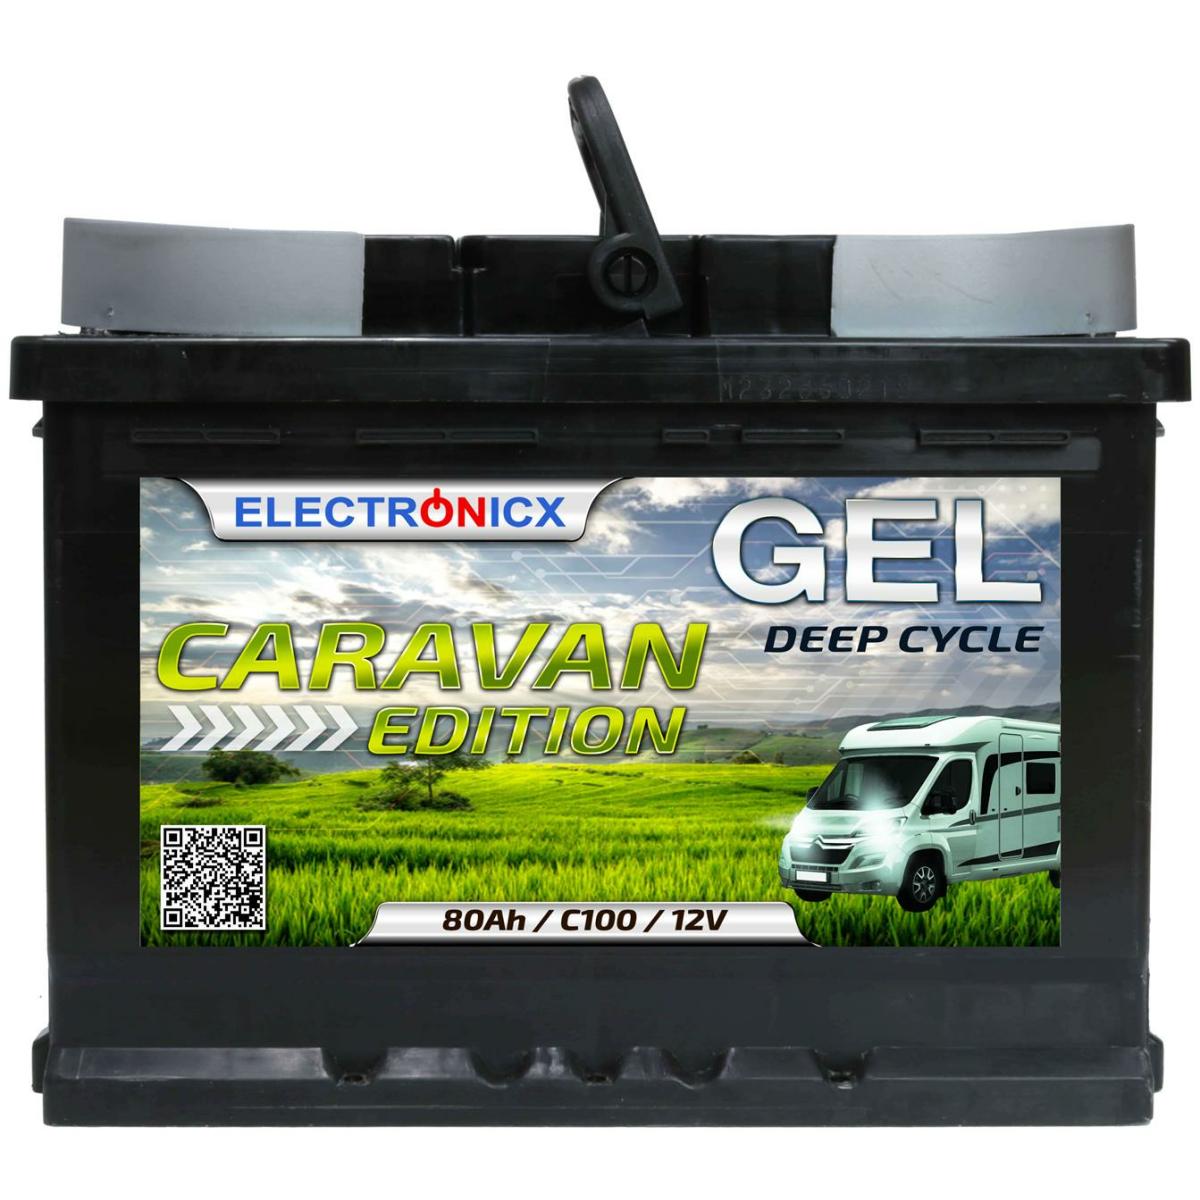 Electronicx Caravan Edition Gel Batterie 80 AH 12V Wohnmobil Boot Versorgung